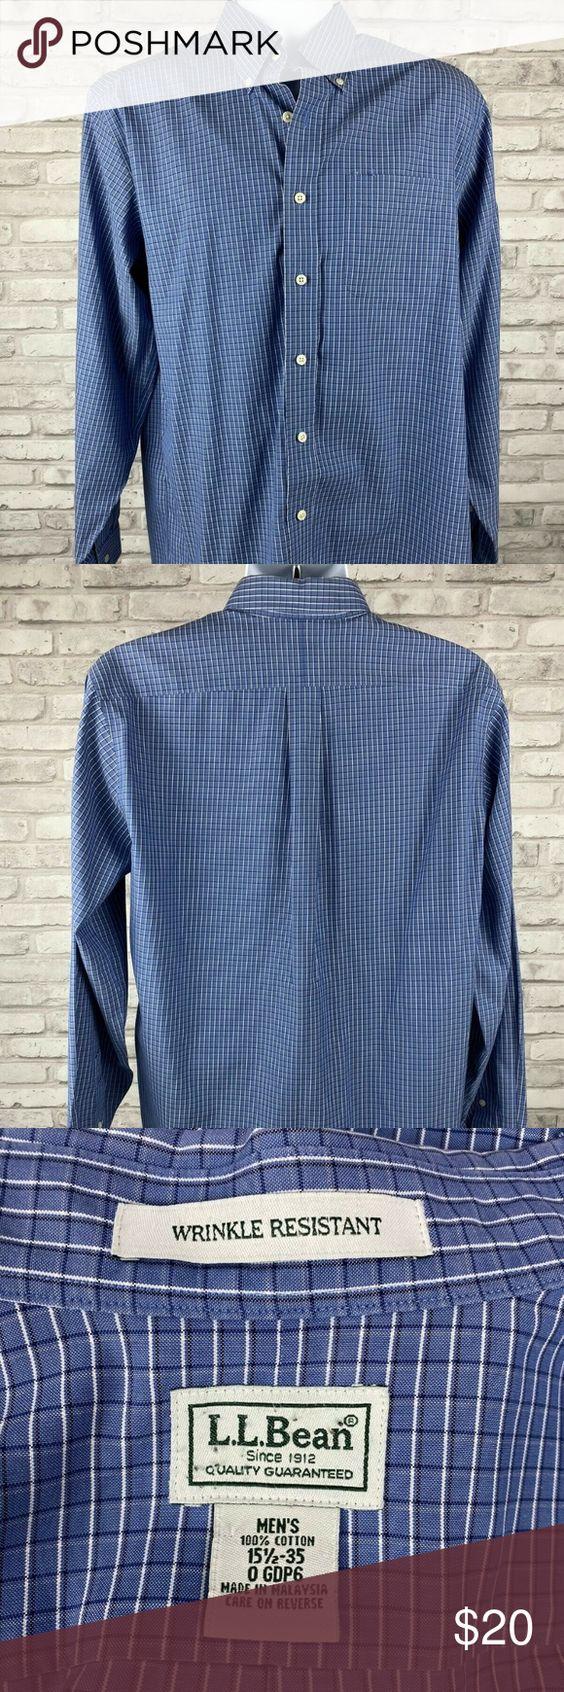 Ll Bean Long Sleeve Blue White Checked Plaid Blue And White Casual Button Down Shirts